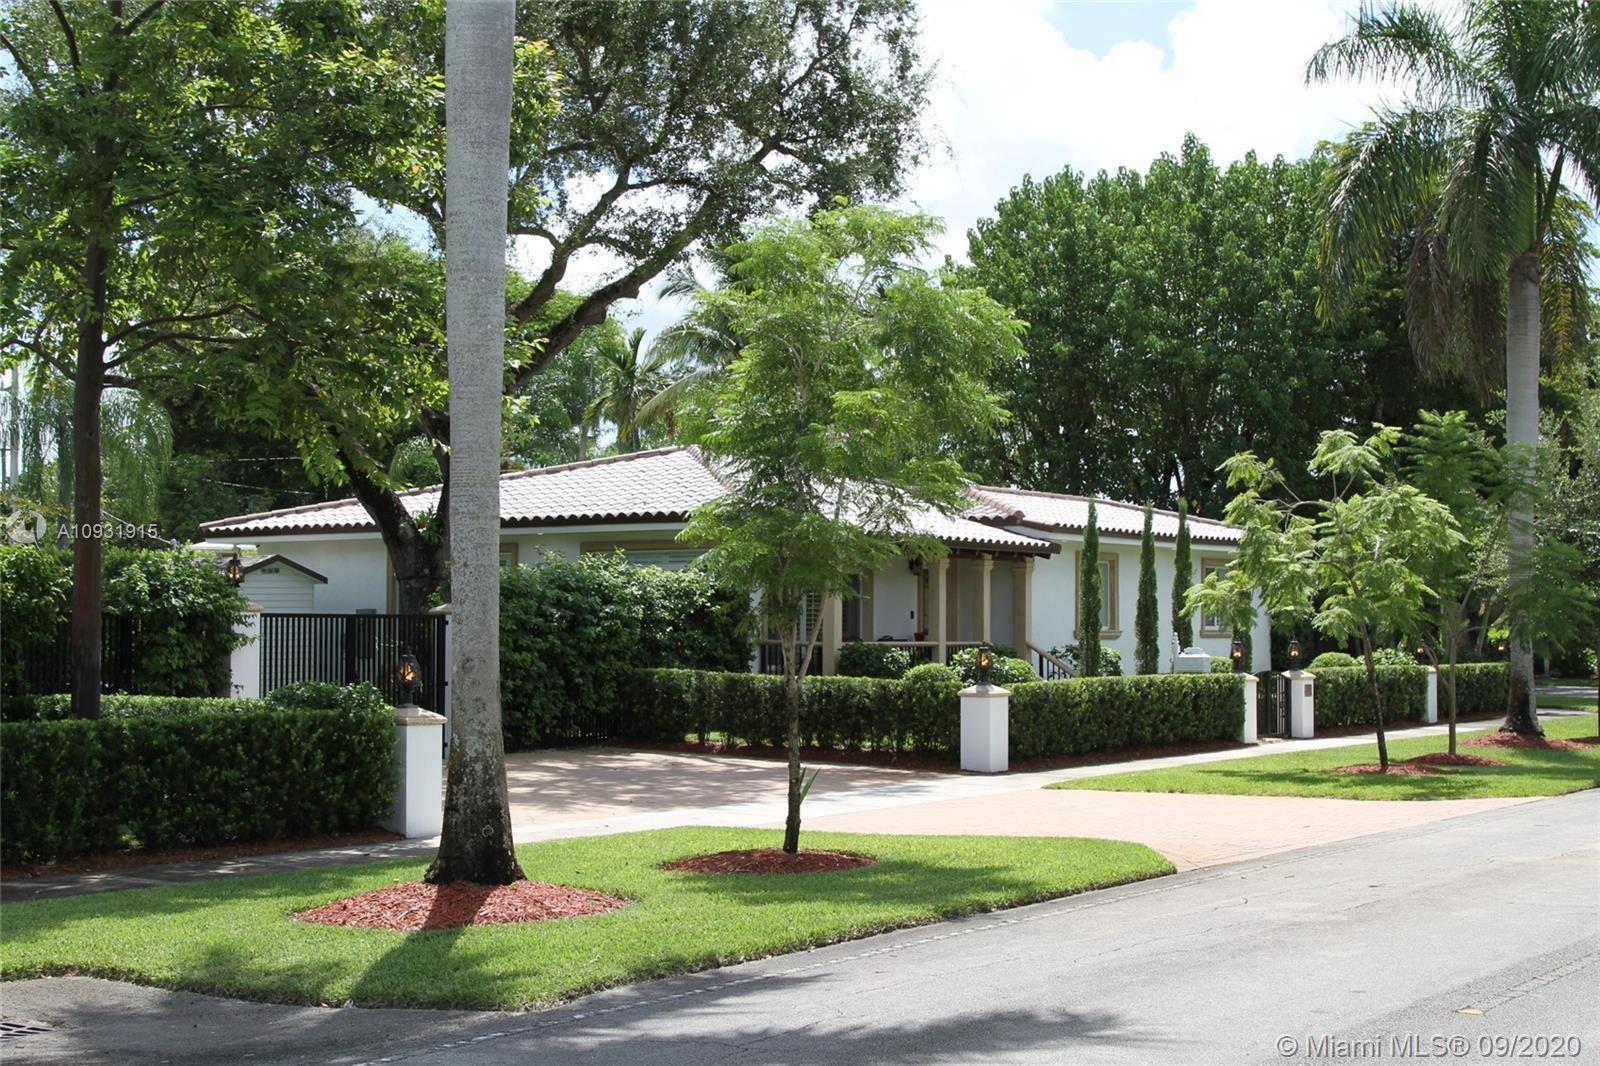 1095 S Sylvania Blvd, West Miami, FL 33144 - #: A10931915